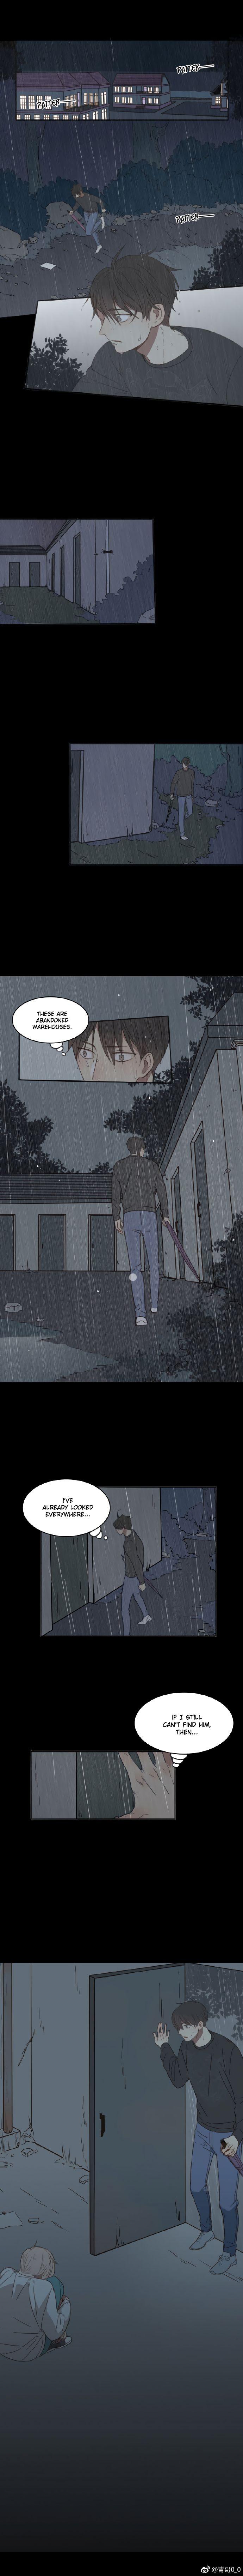 https://im.nineanime.com/comics/pic9/57/20473/418300/SilentColor120878.jpg Page 1